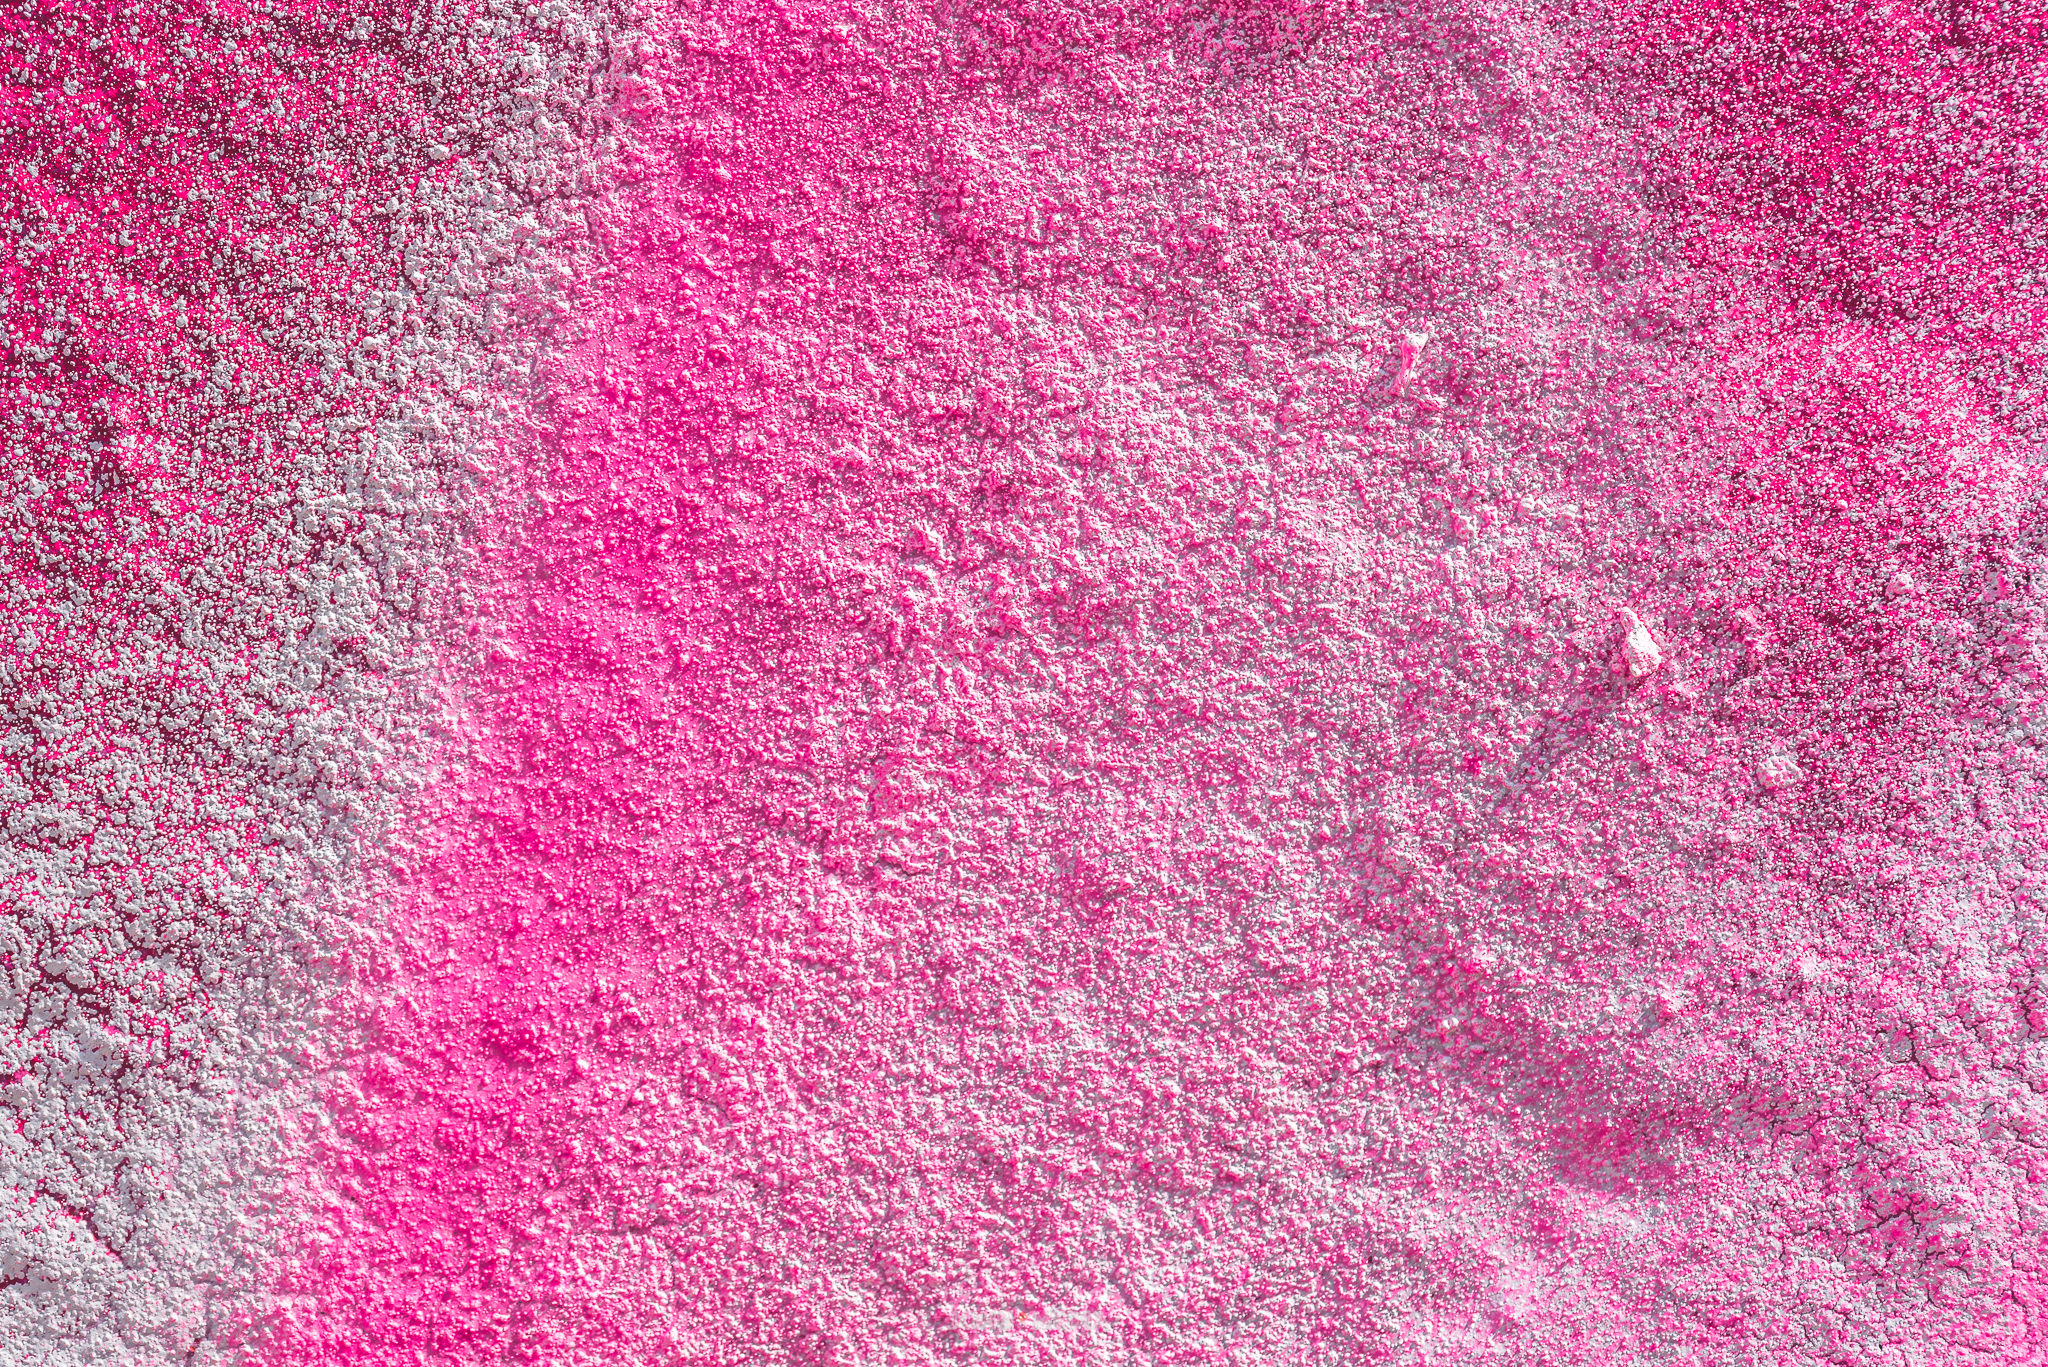 Macro Brighton - Pink fade